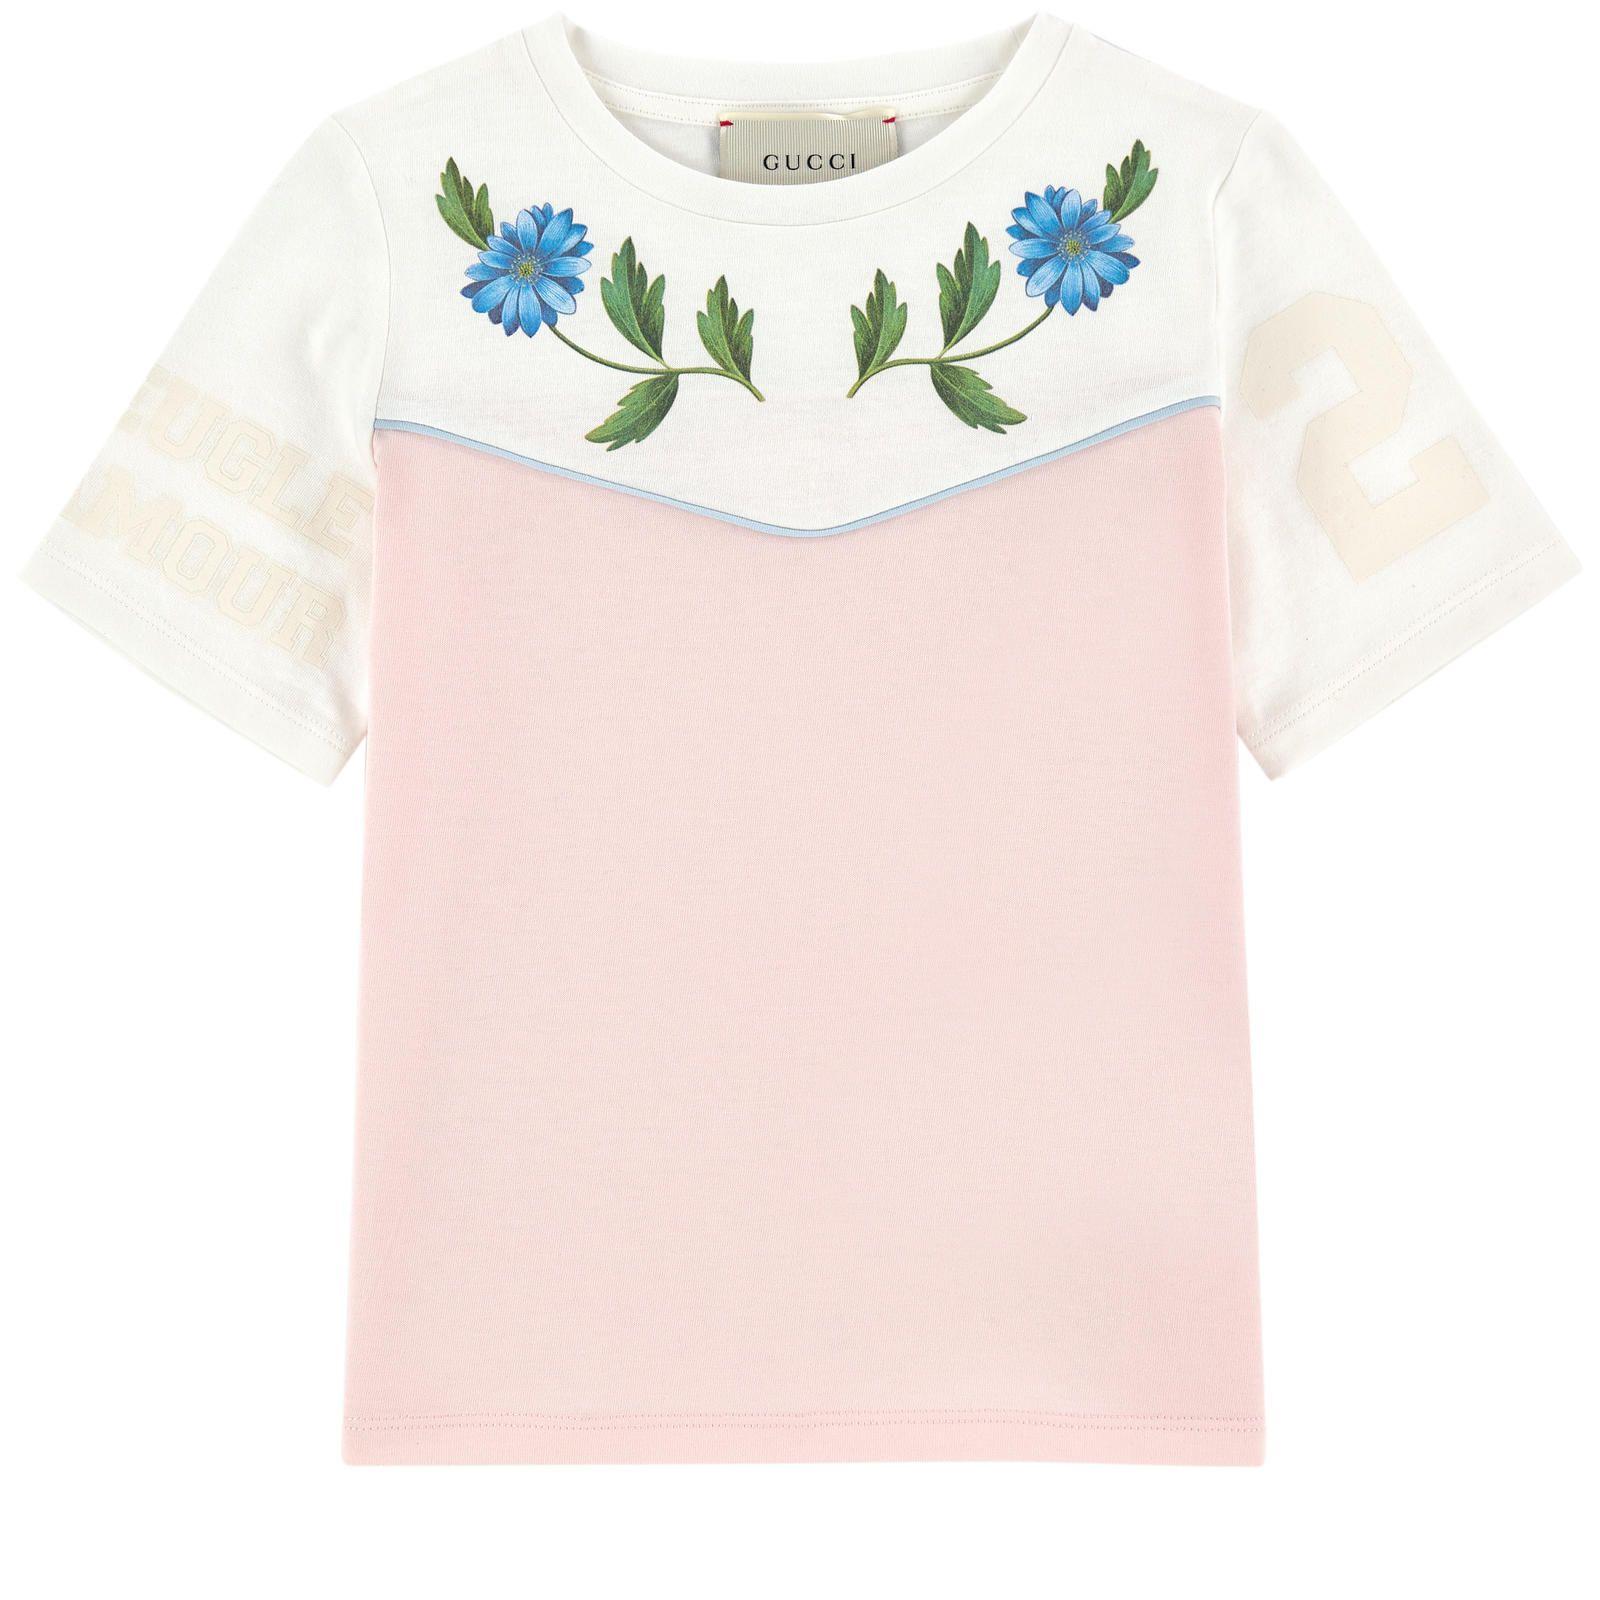 db0a06b38 Printed T-shirt Pepe Jeans, Top Designer Brands, Designer Kids Clothes,  Branding